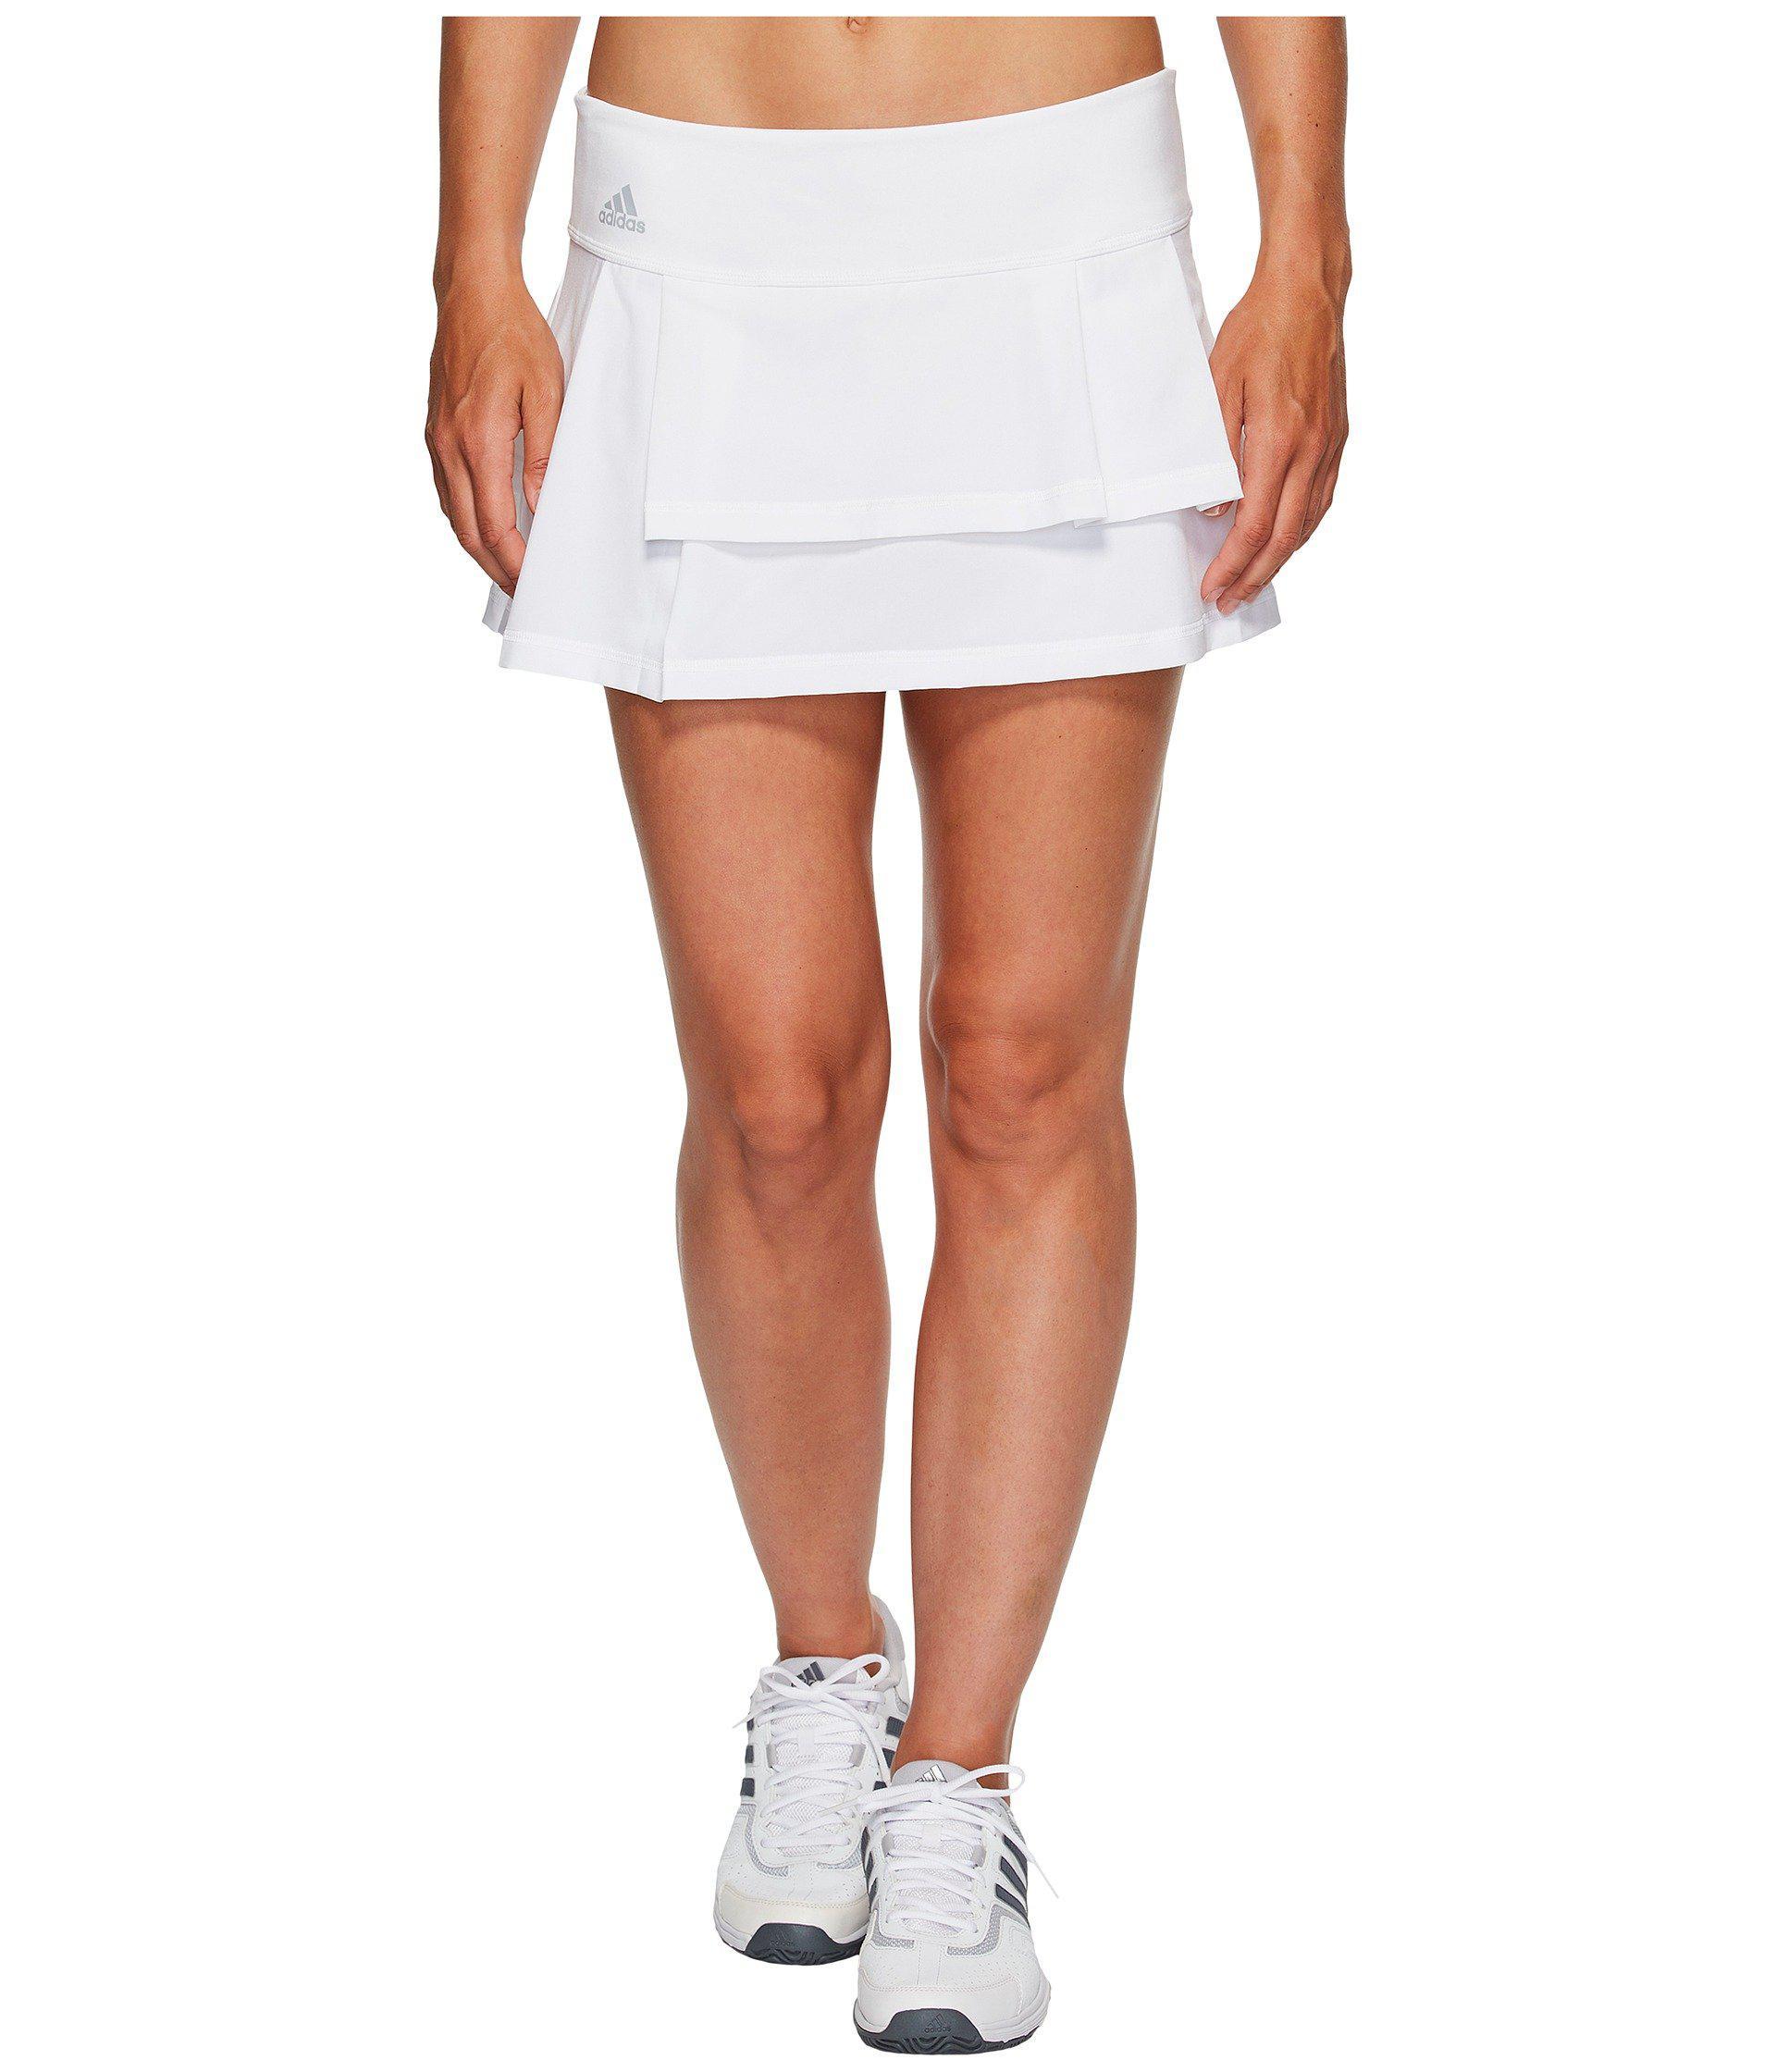 80b3a1b415 adidas Advantage Layered Skirt in White - Lyst